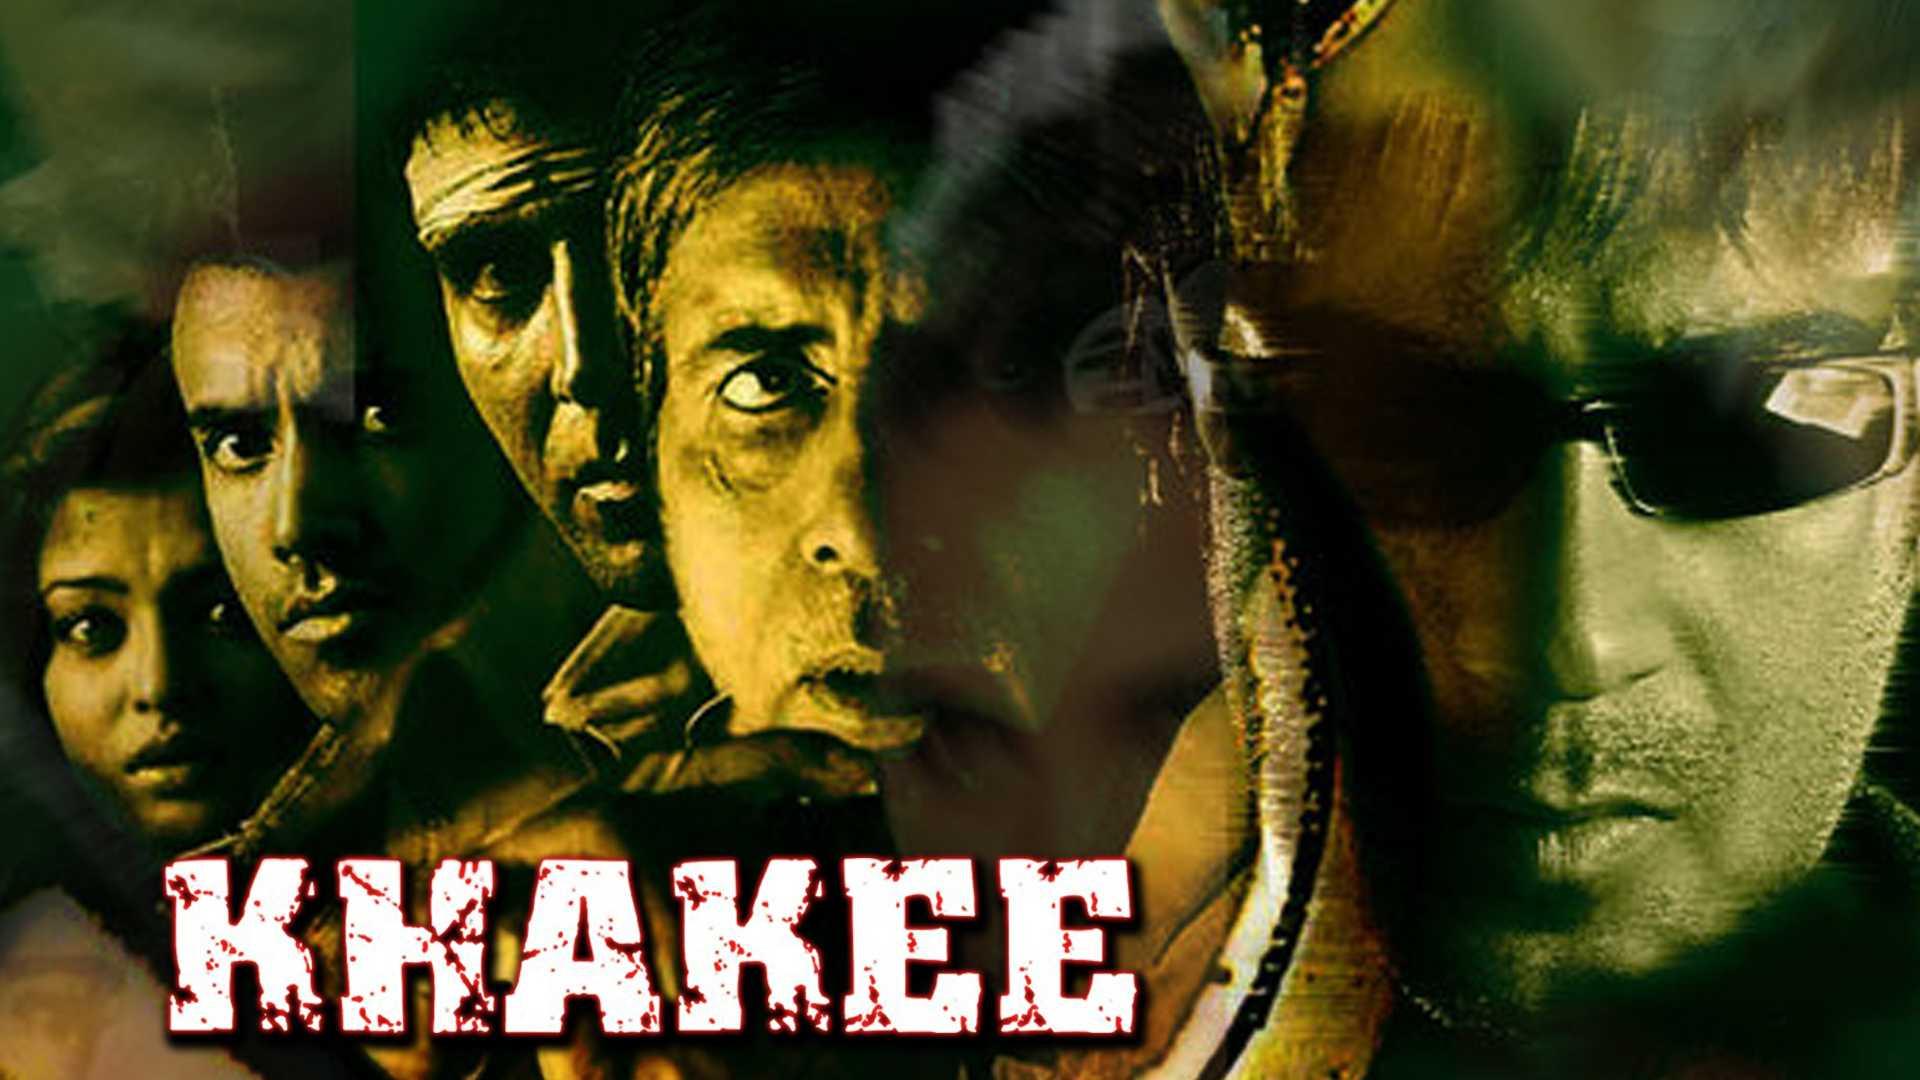 Khakee Movie Quotes Status - Complete List